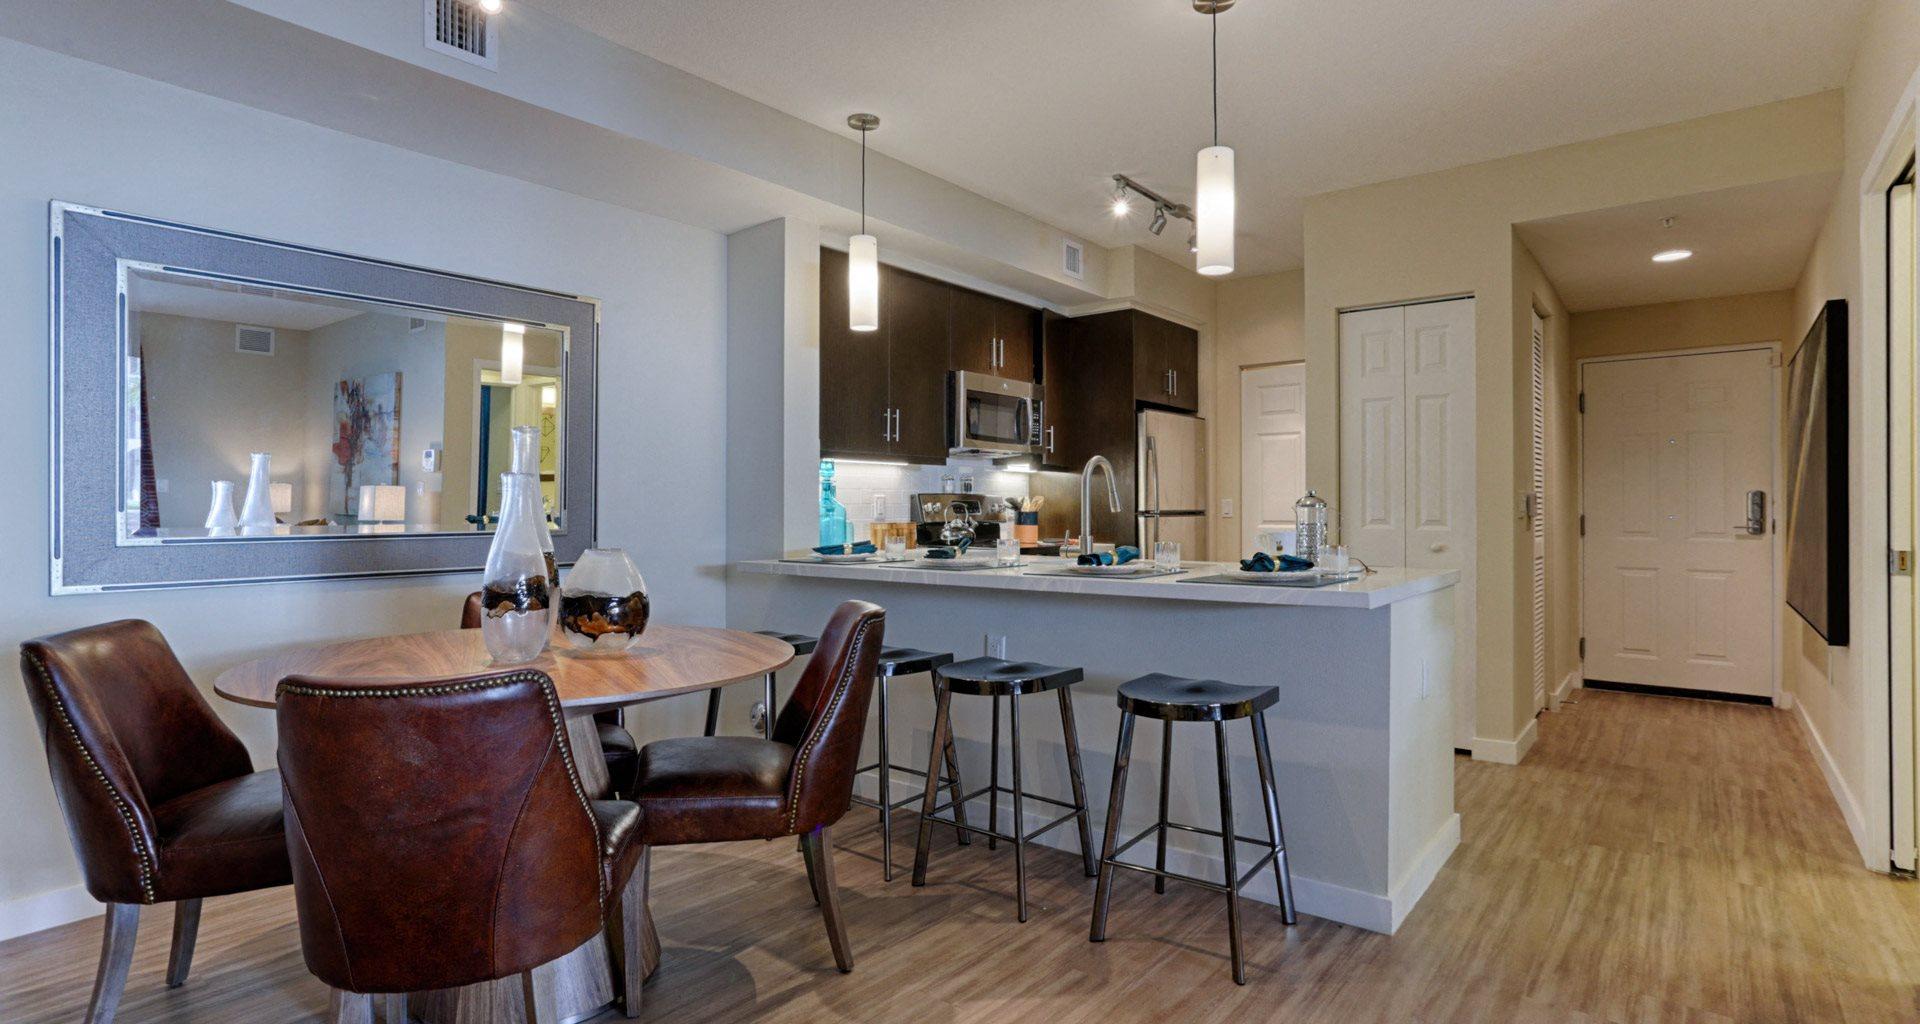 Kitchen With Breakfast Bar At Mirador Doral By Windsor FL 33122